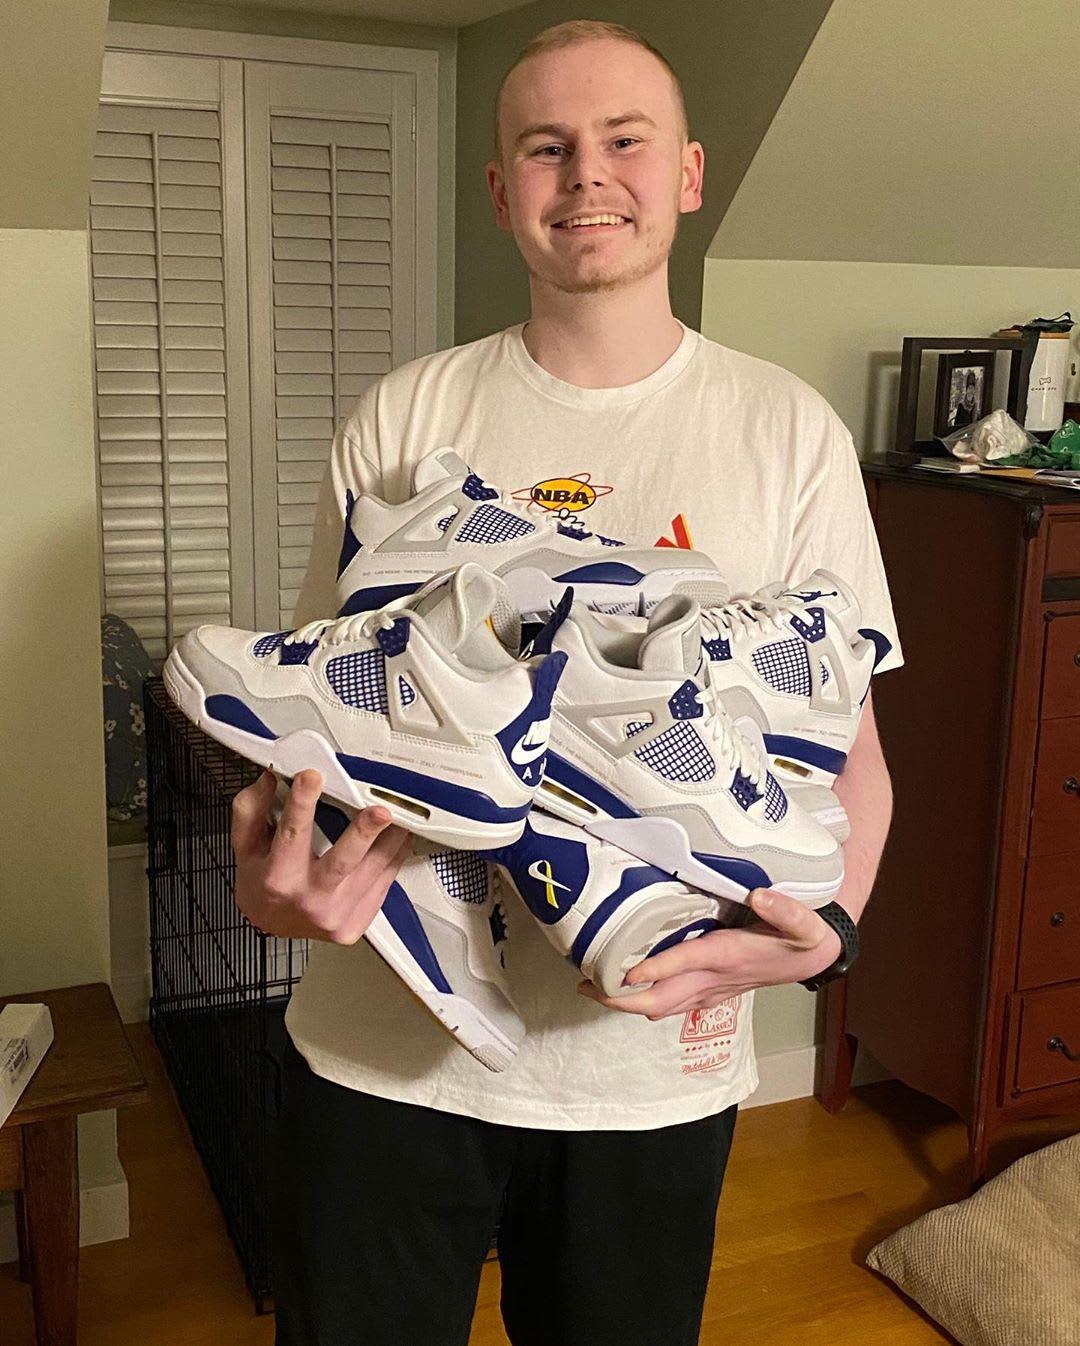 Air Jordan 4 'Make-A-Wish' Peyton Smith